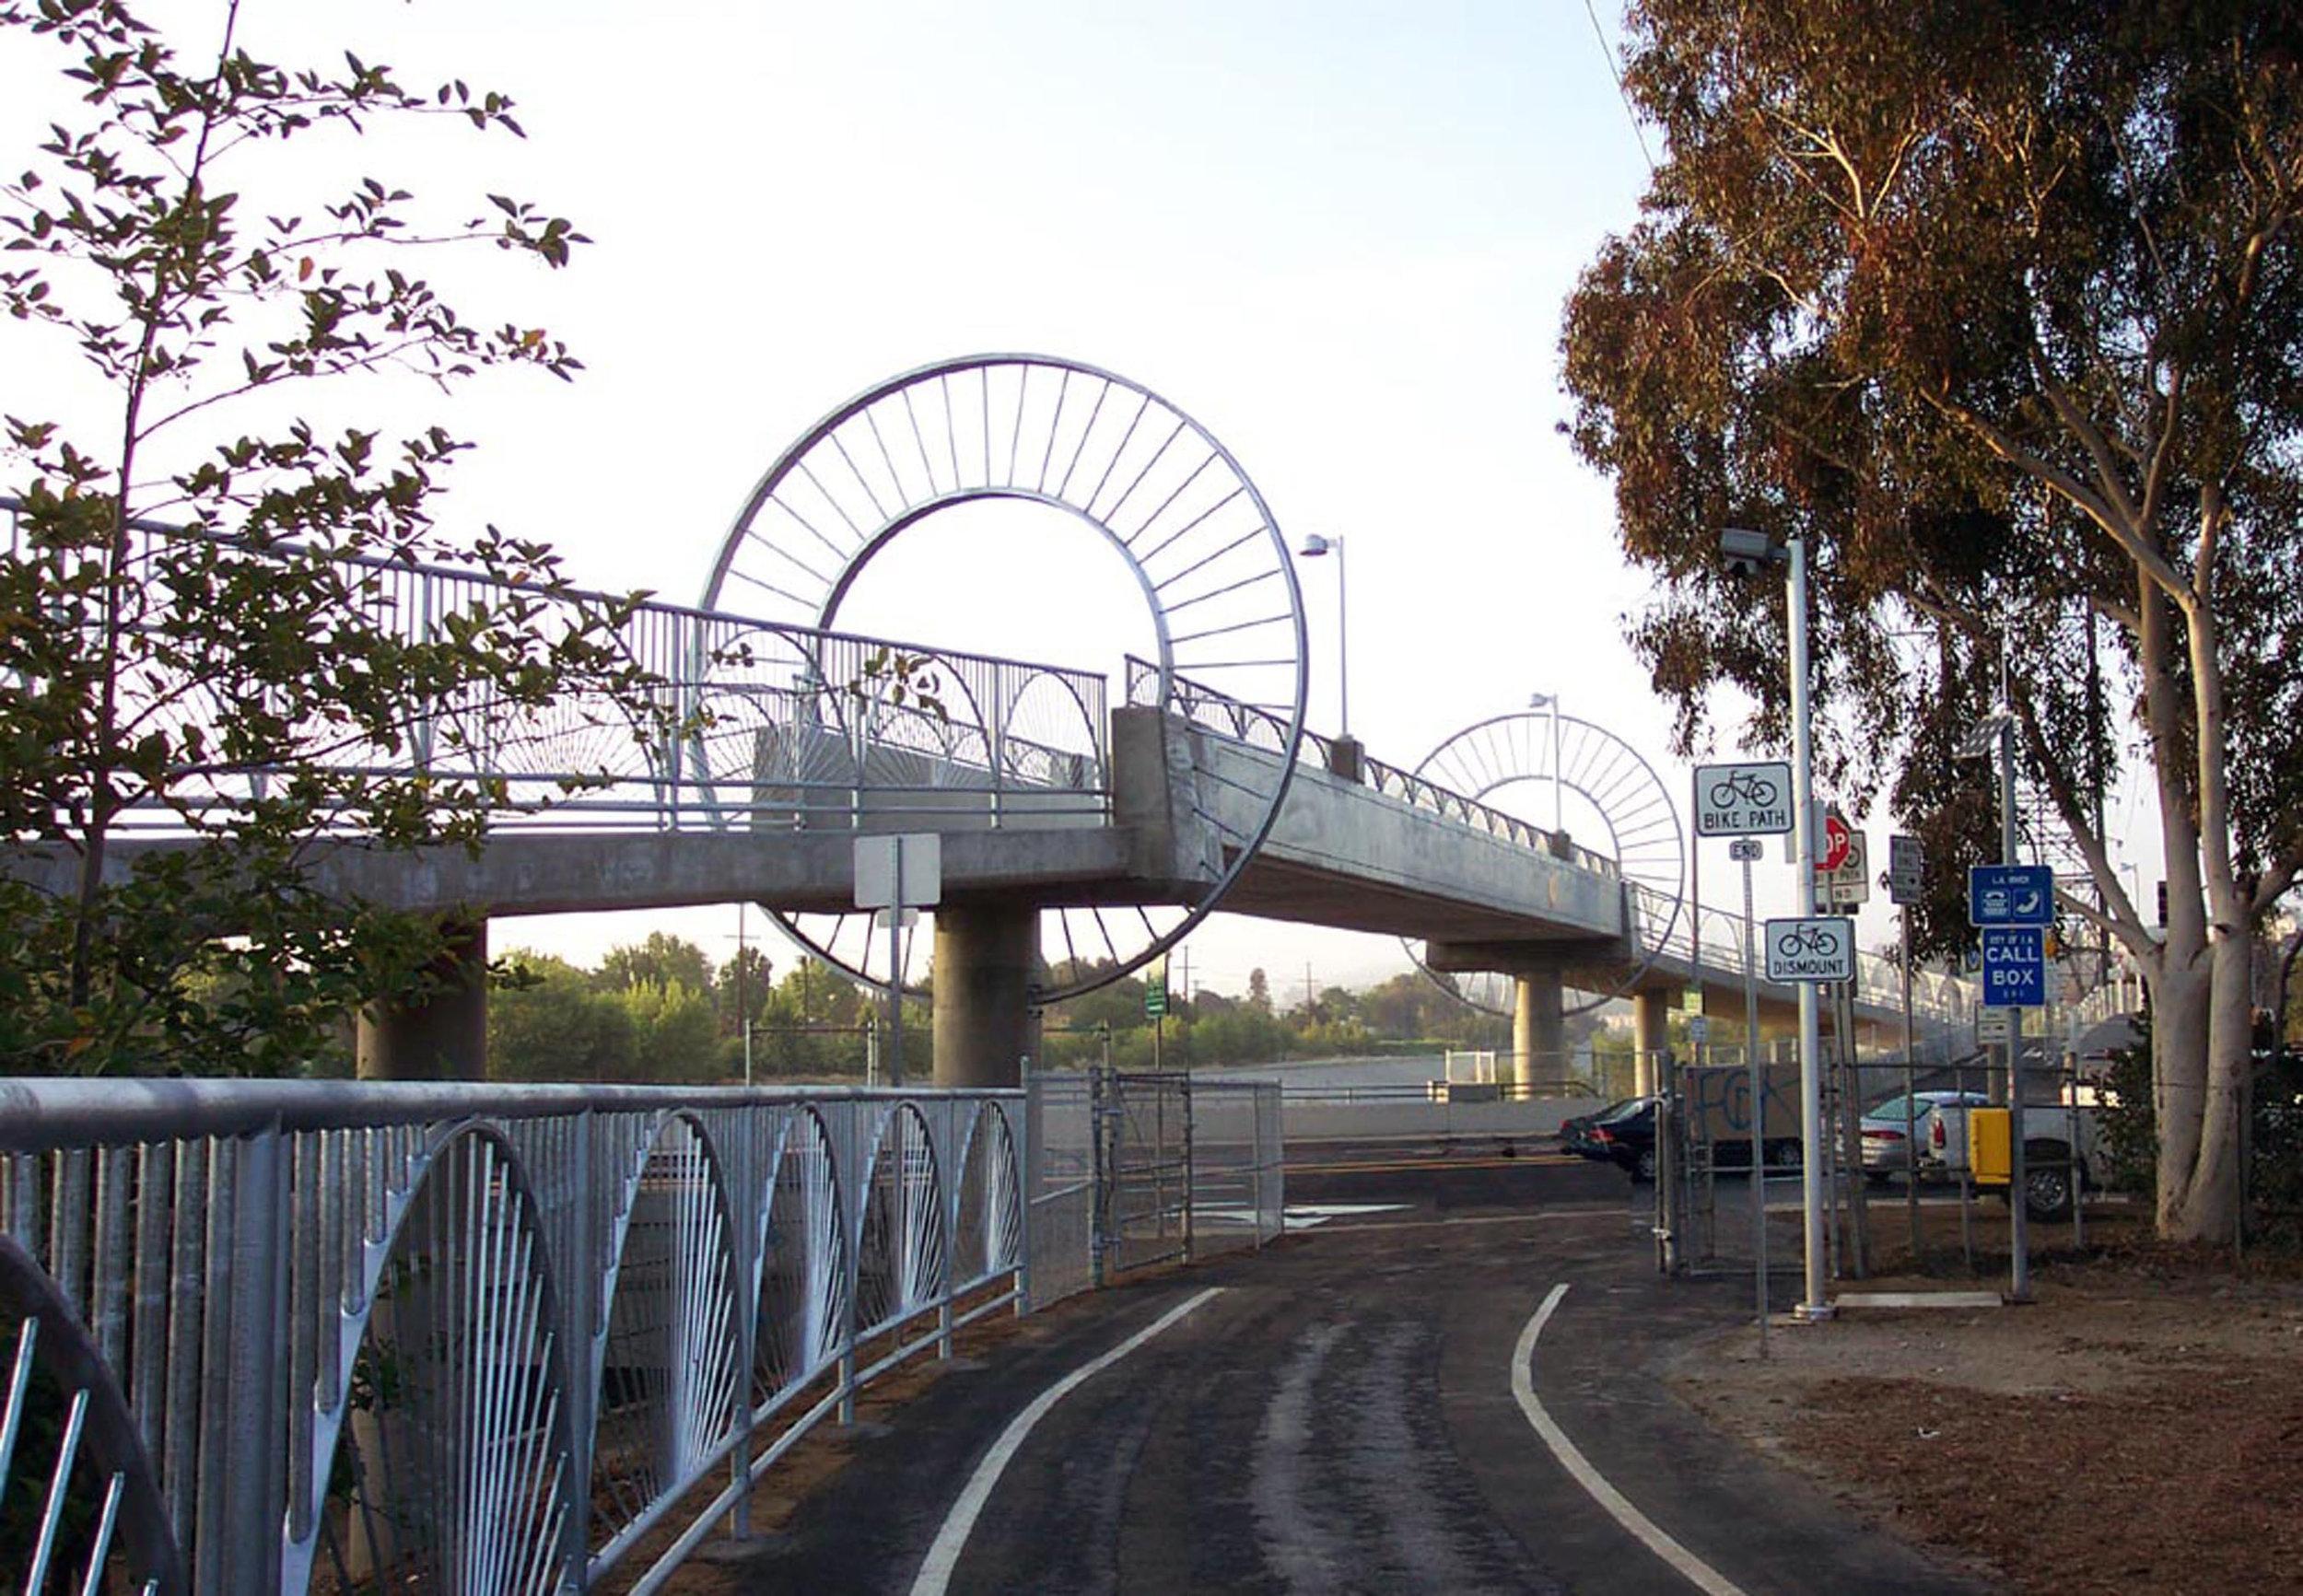 Alex Baum Bike Bridge - Los Angeles Department of Transportation and Bureau of Engineering